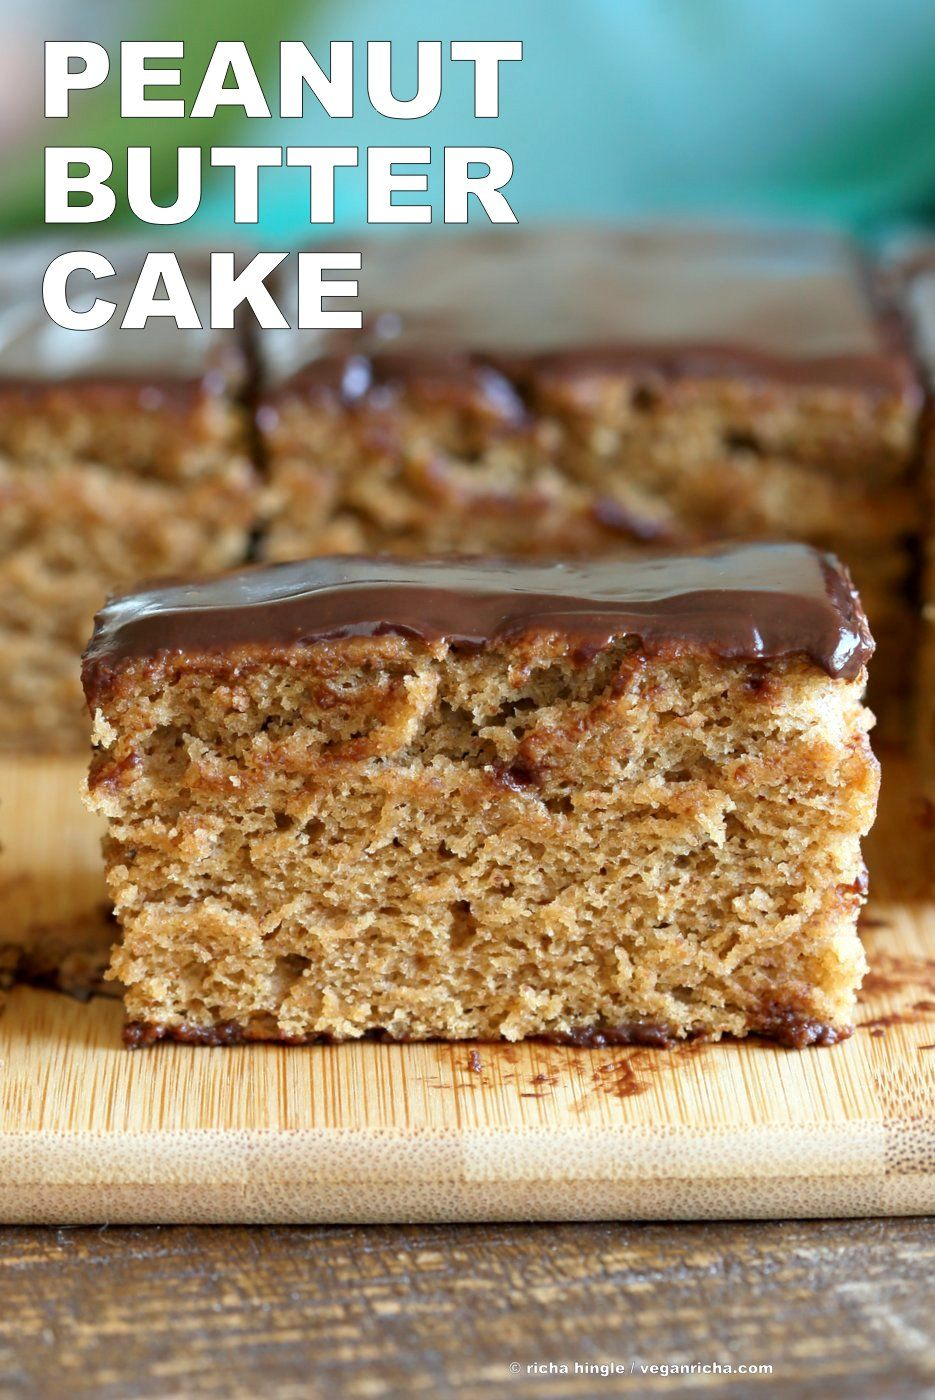 Vegan Peanut Butter Cake With Chocolate Peanut Butter Glaze Vegan Richa Recipe Peanut Butter Cake Vegan Cake Recipes Dessert Recipes